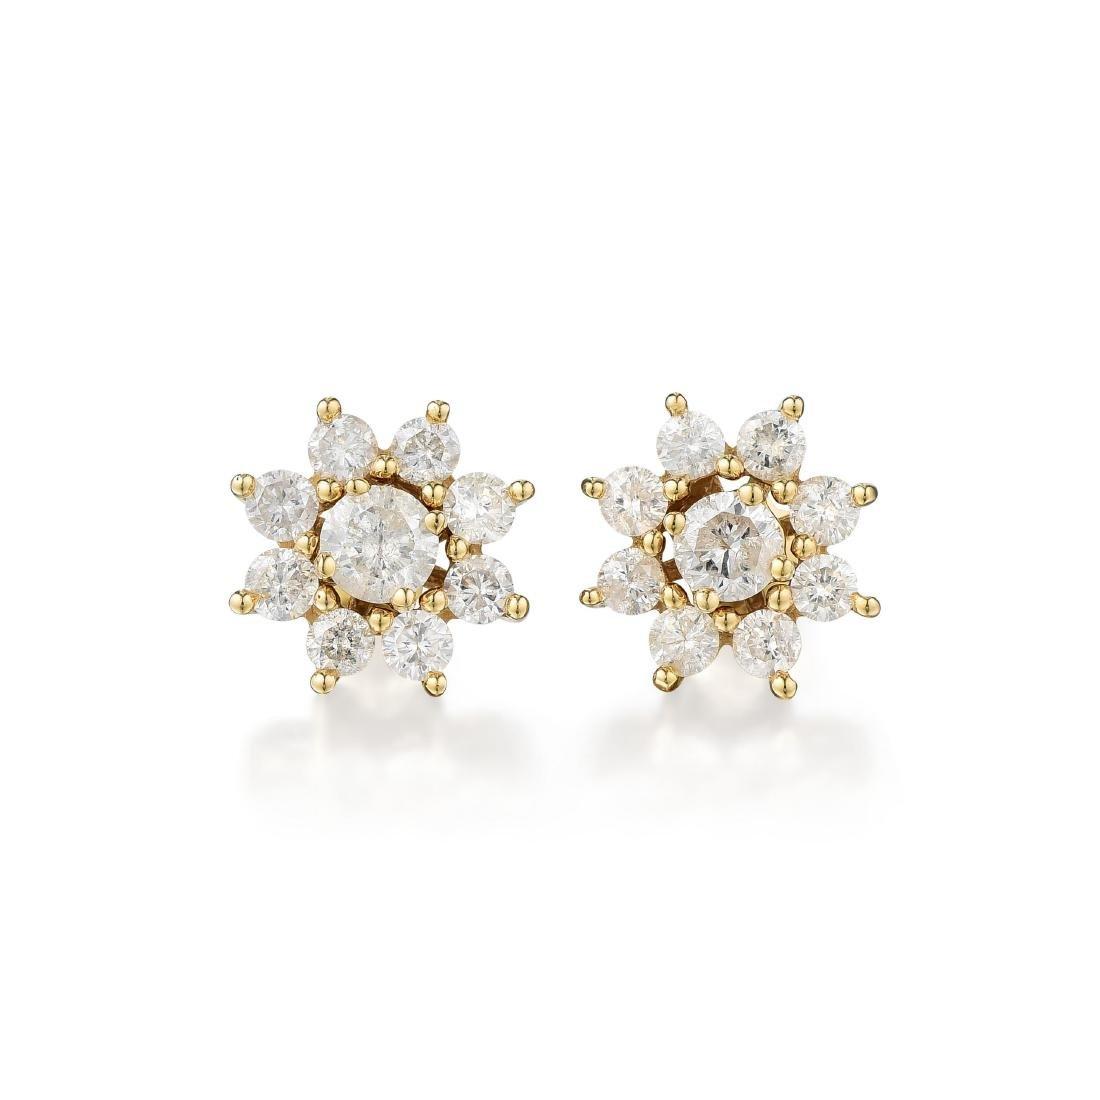 A Pair of 14K Gold Diamond Earrings